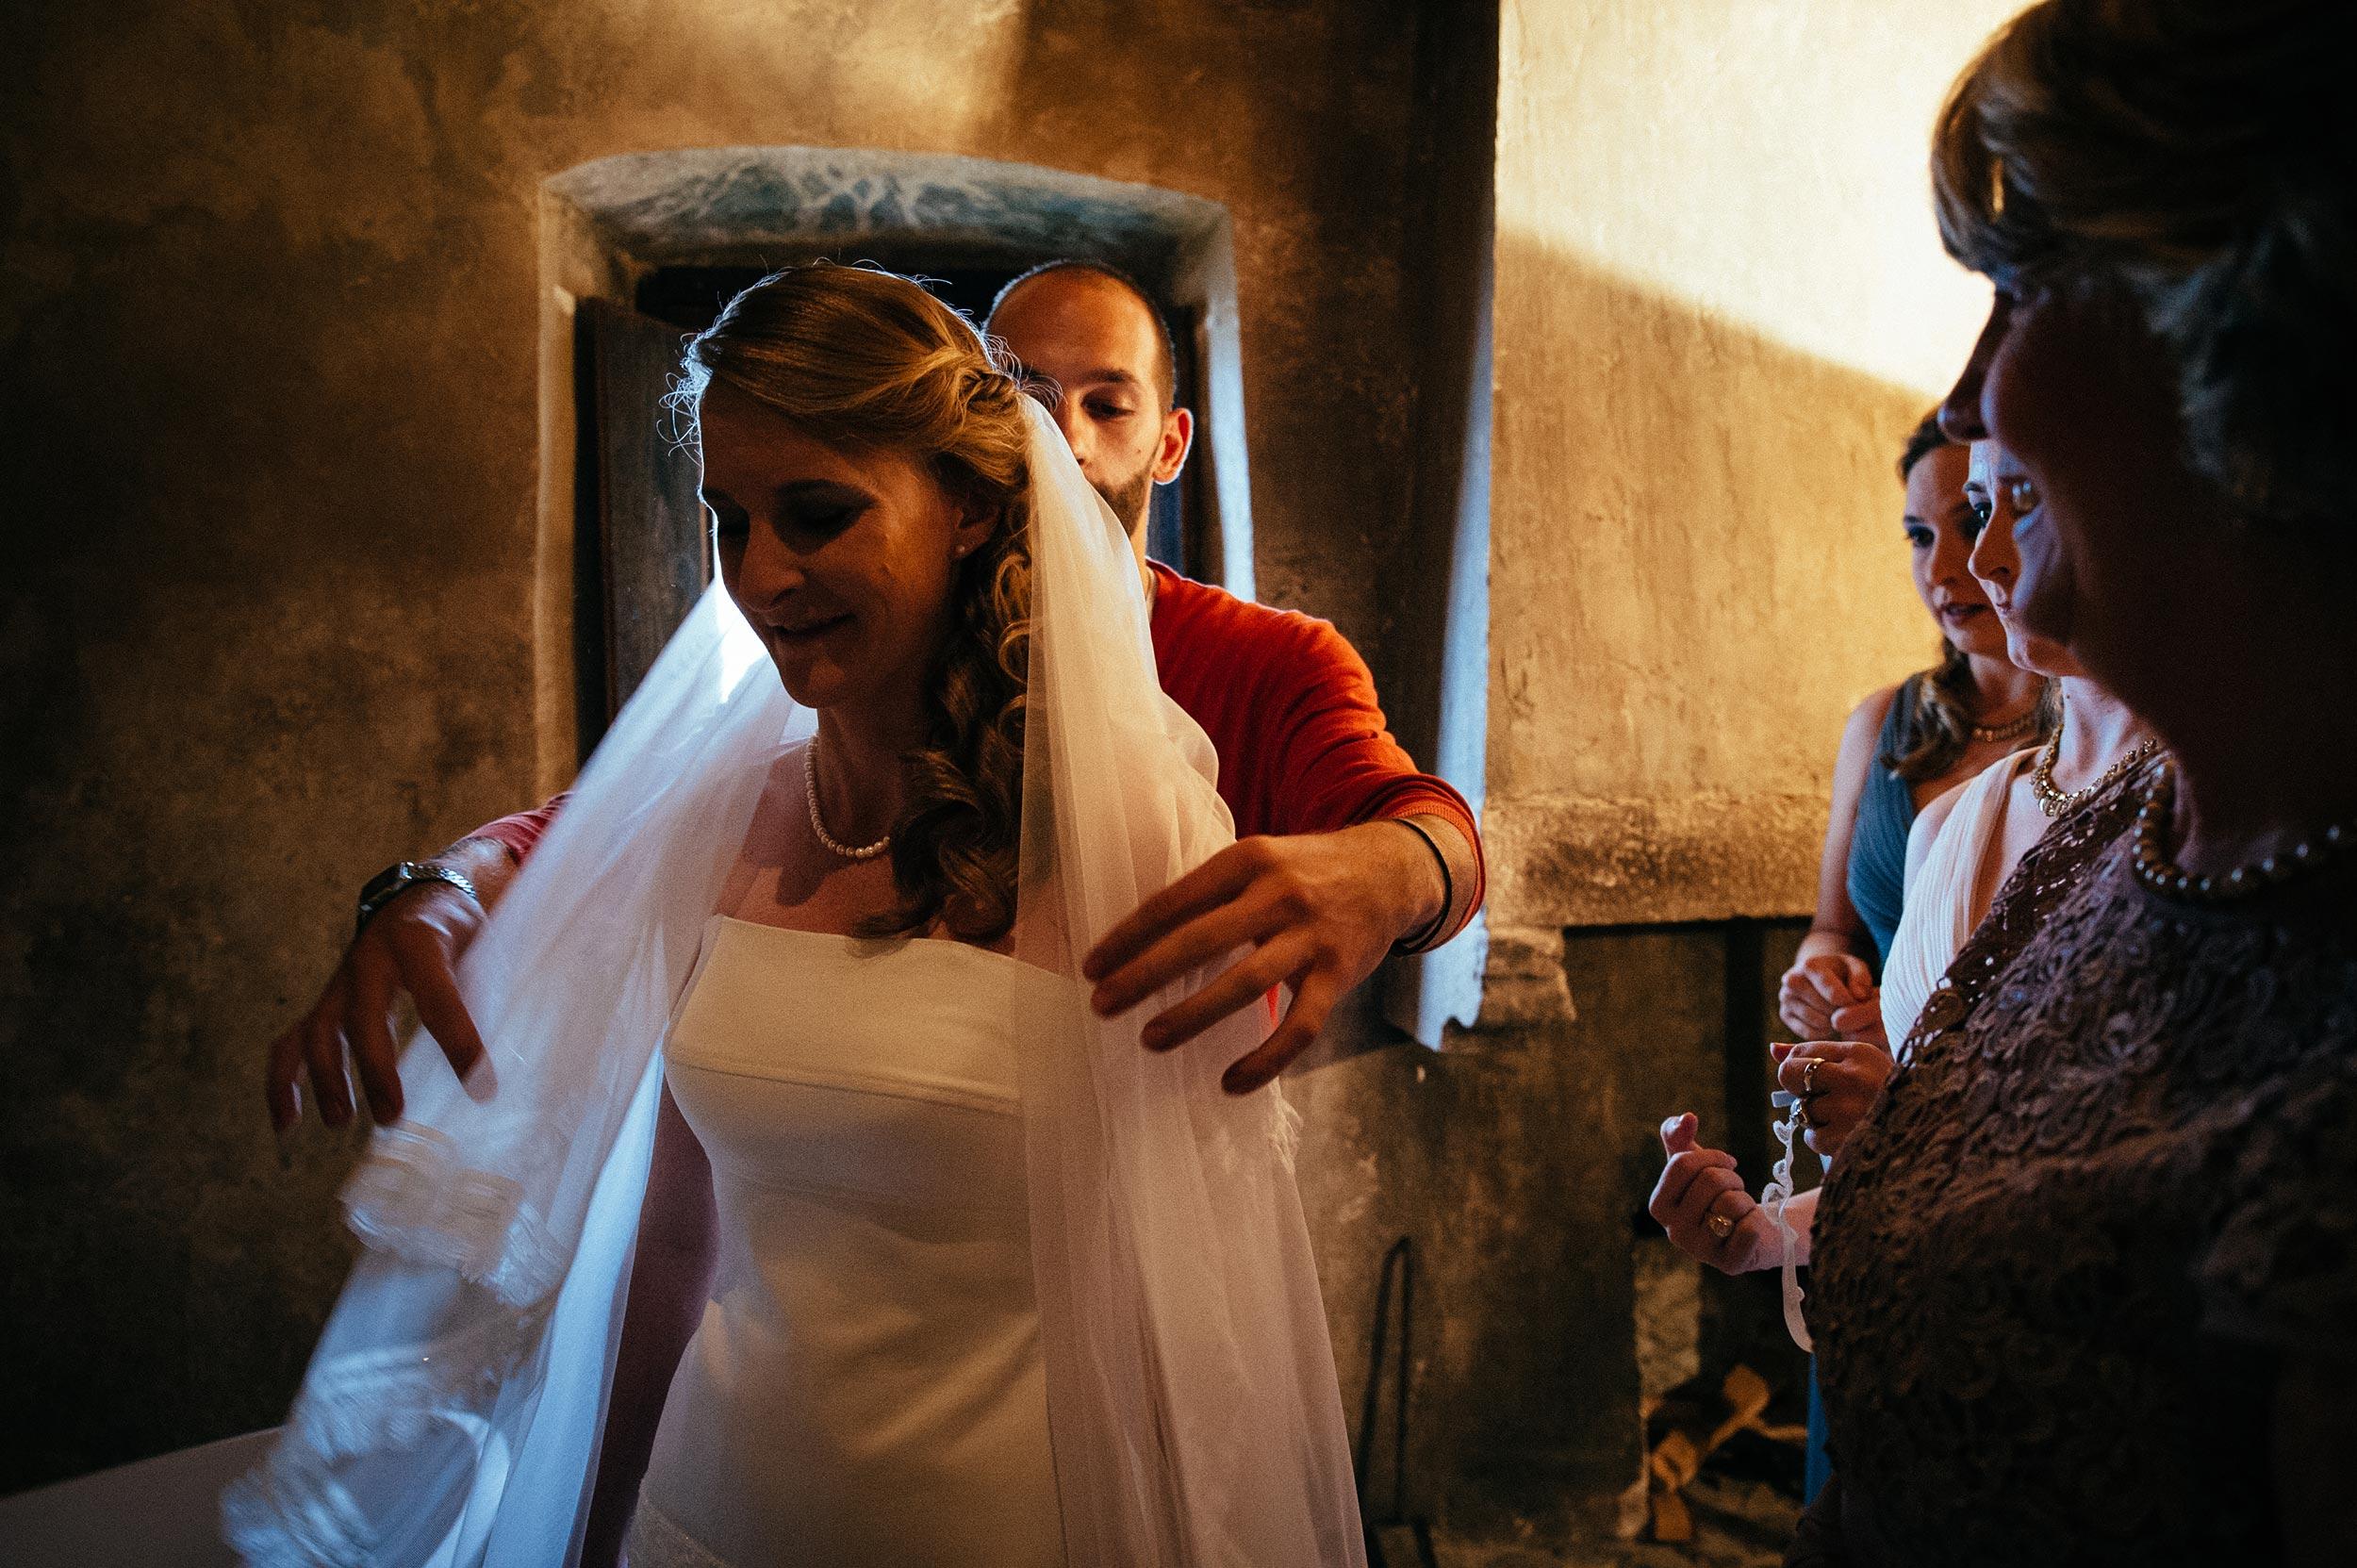 2014-Shelby-Jocelyn-Santo-Stefano-Di-Sessanio-Wedding-Photographer-Italy-Alessandro-Avenali-23.jpg